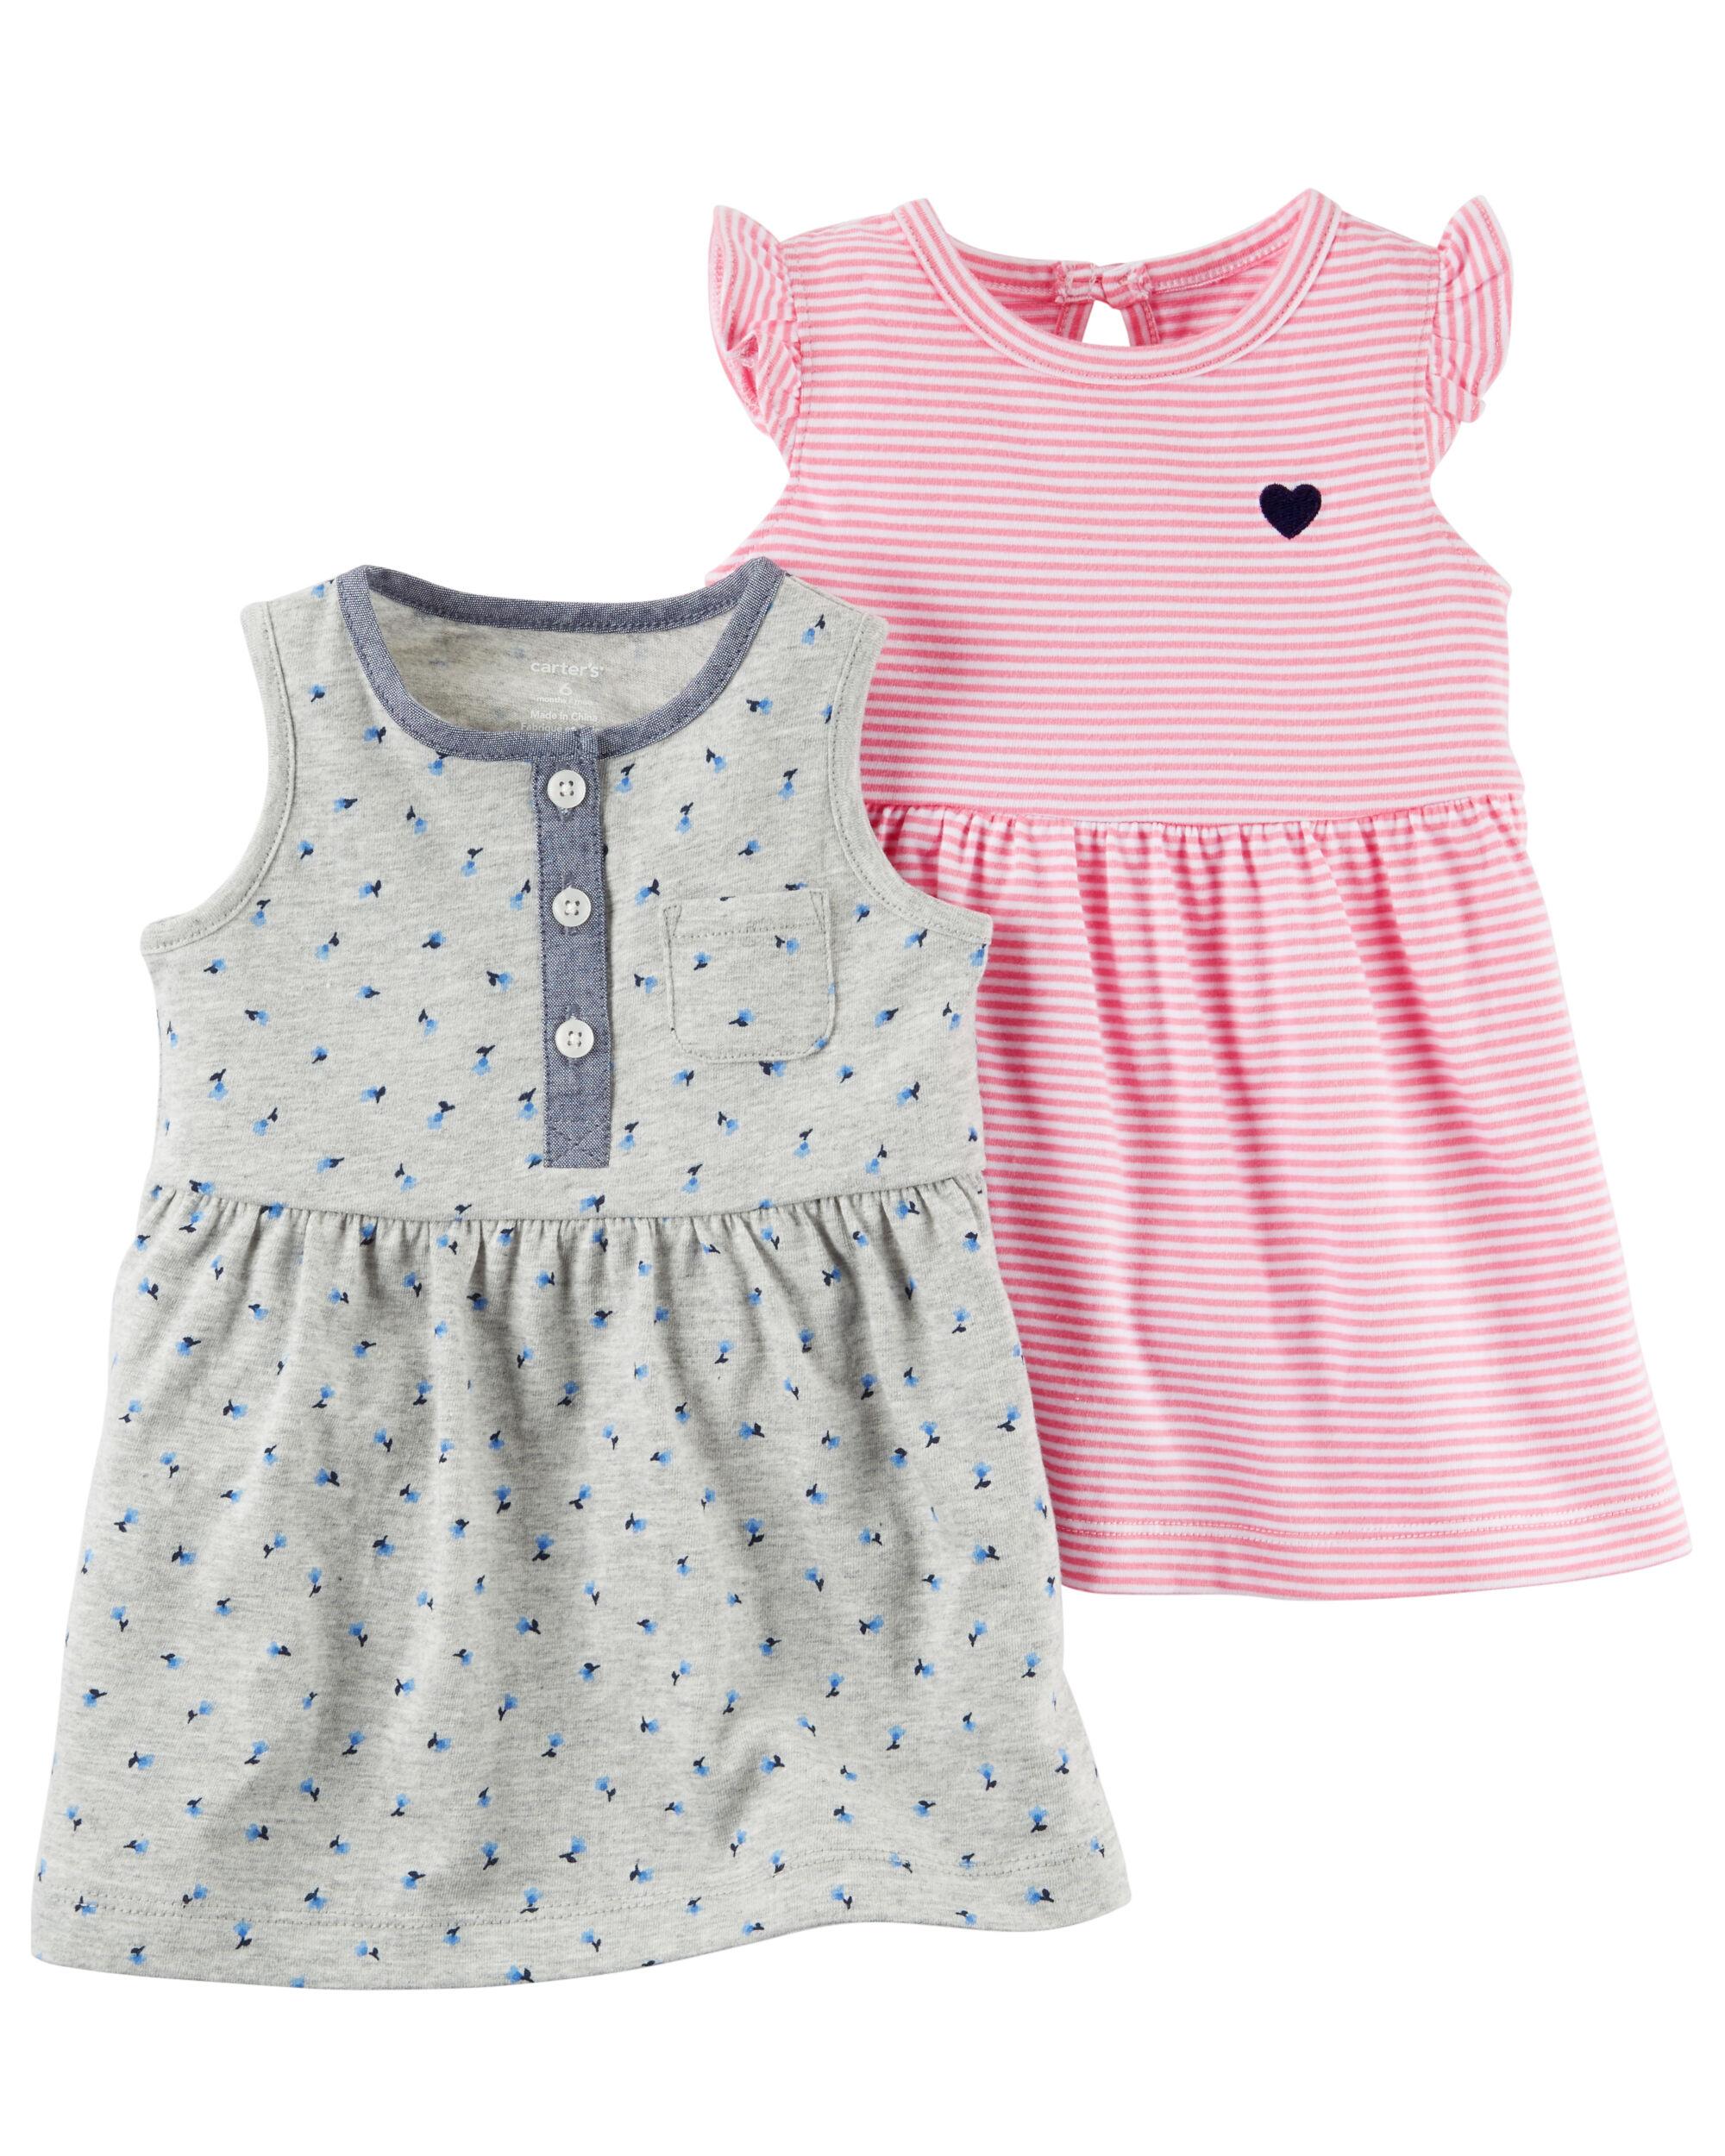 2 Pack Dress Set